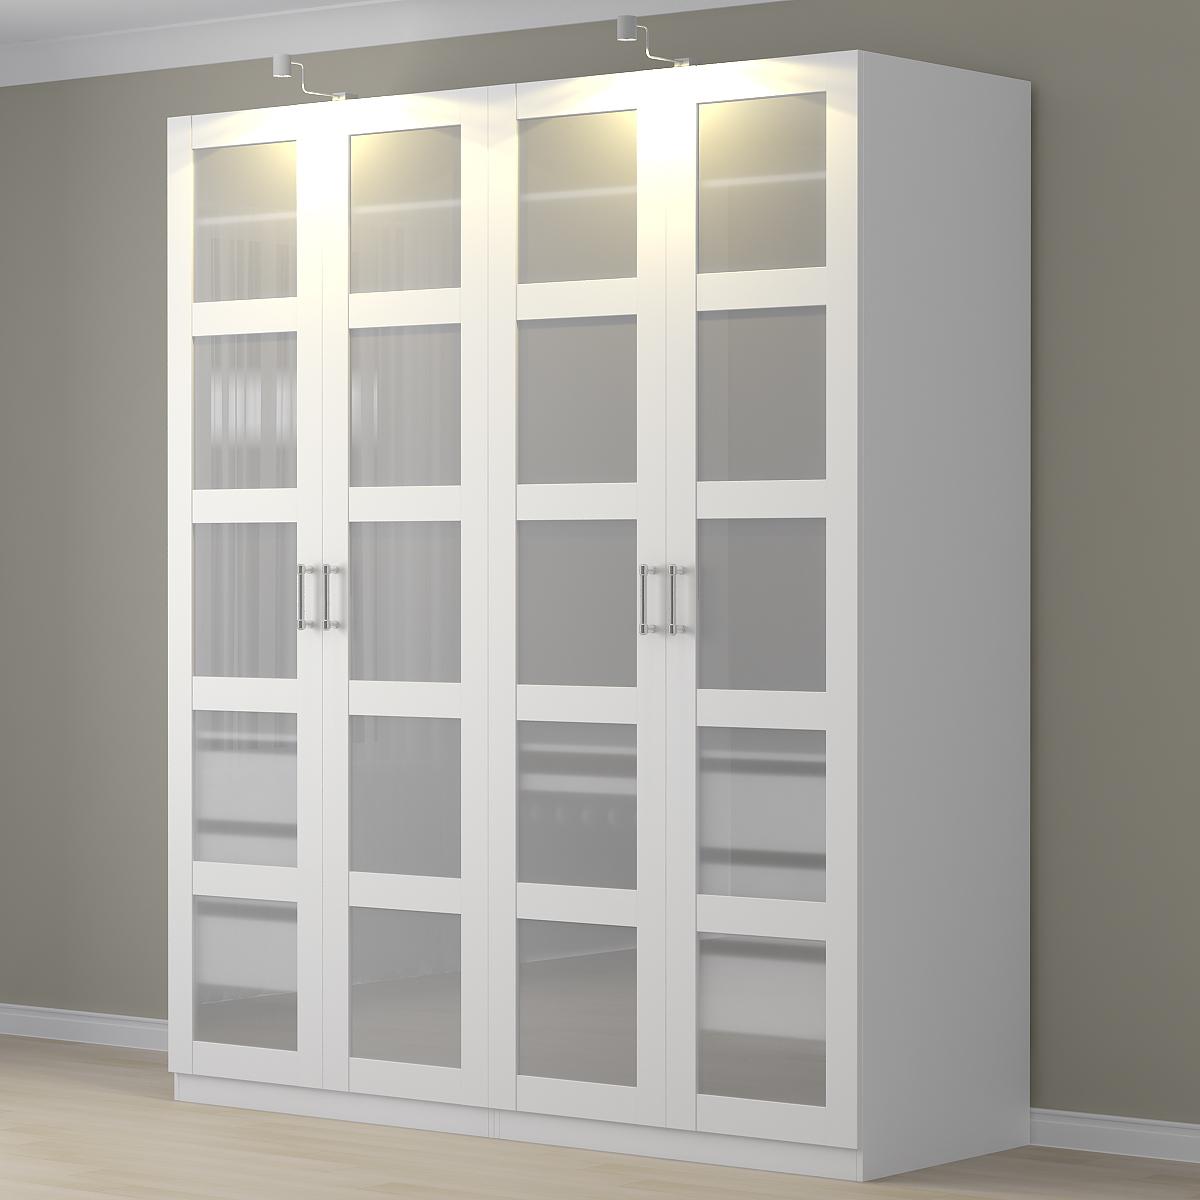 buy online 23713 09375 Wardrobe Ikea Pax/Bergsbo.